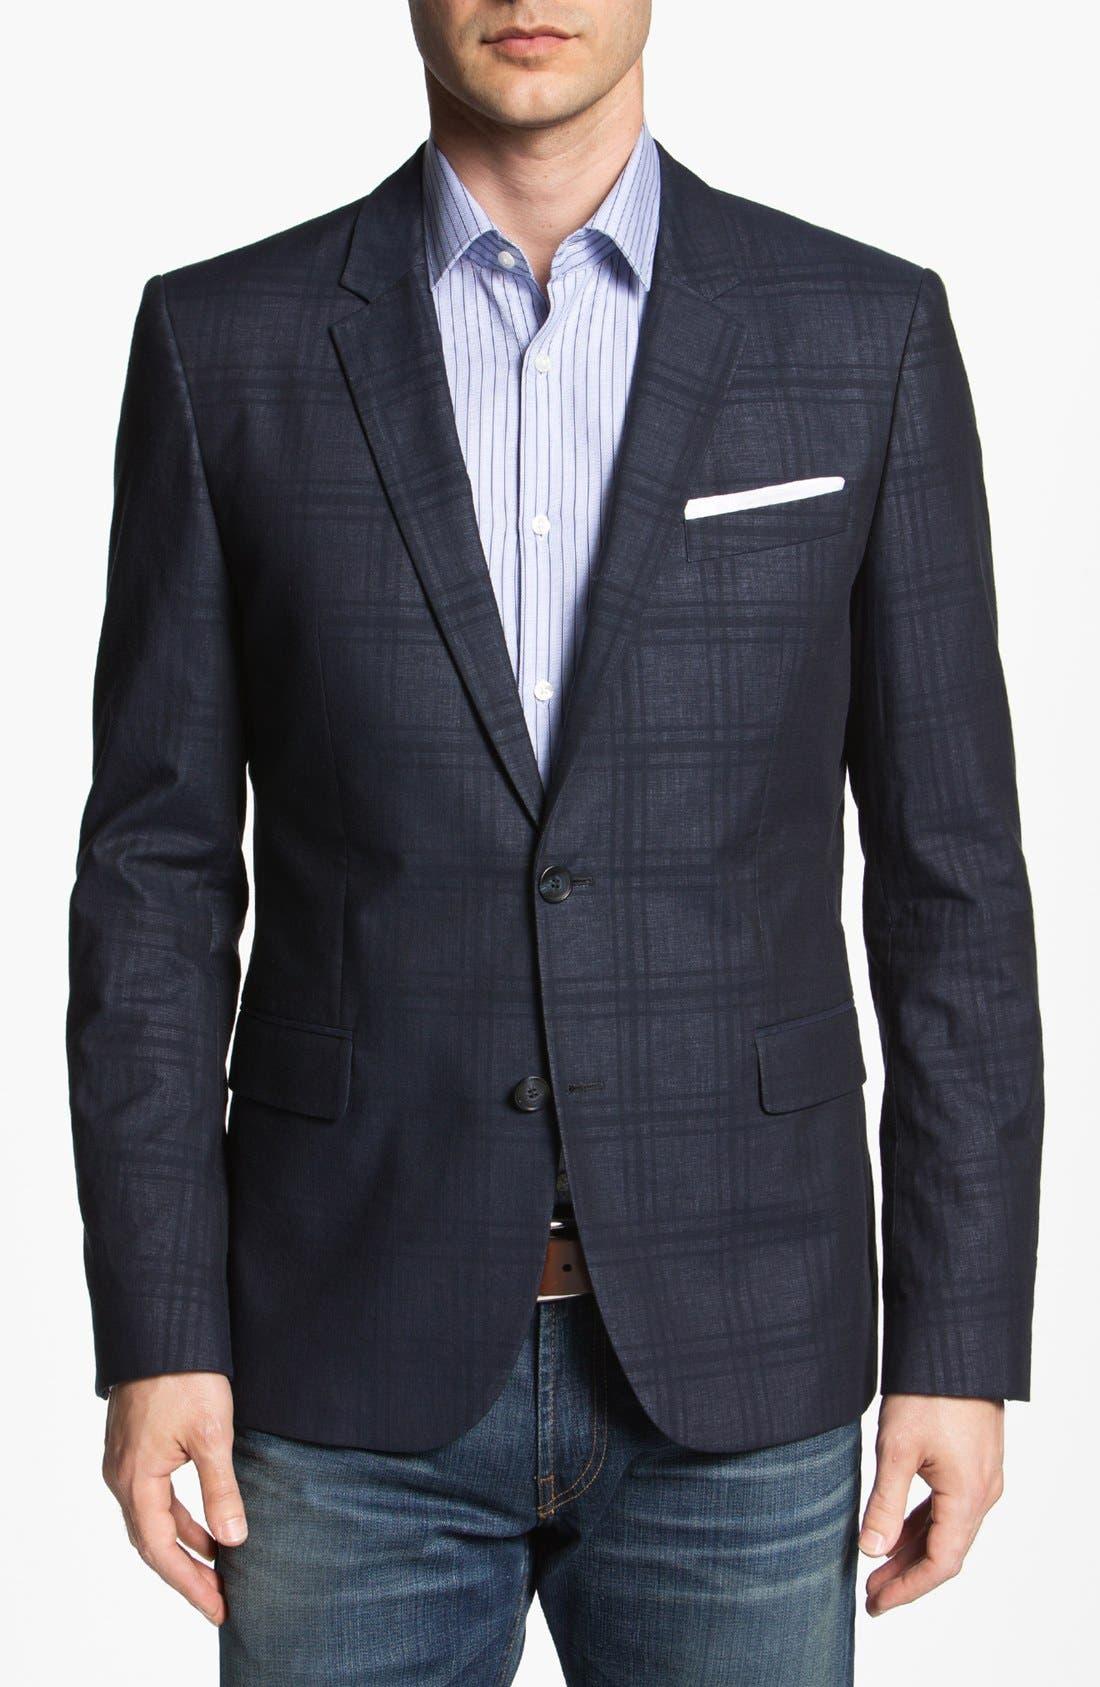 Alternate Image 1 Selected - HUGO 'Amares' Extra Trim Fit Plaid Sportcoat